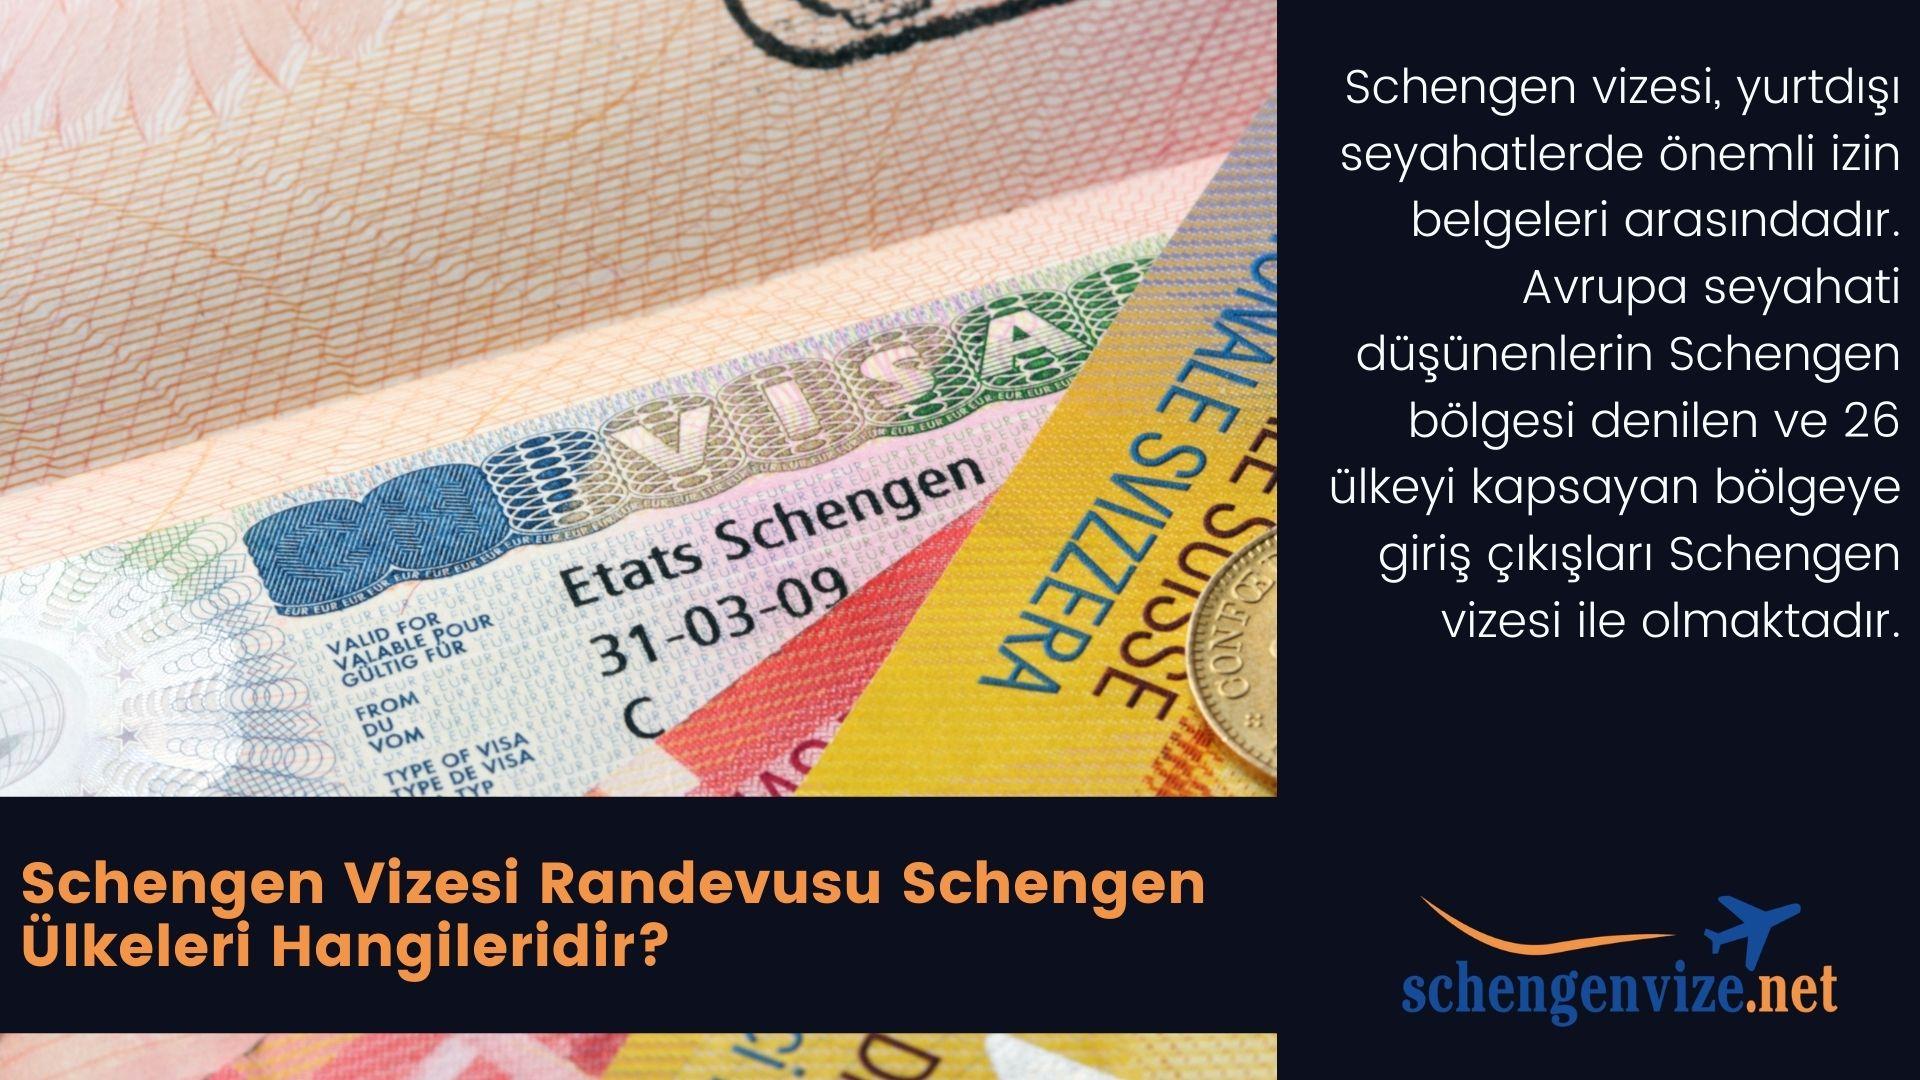 Schengen Vizesi Randevusu Schengen Ülkeleri Hangileridir?